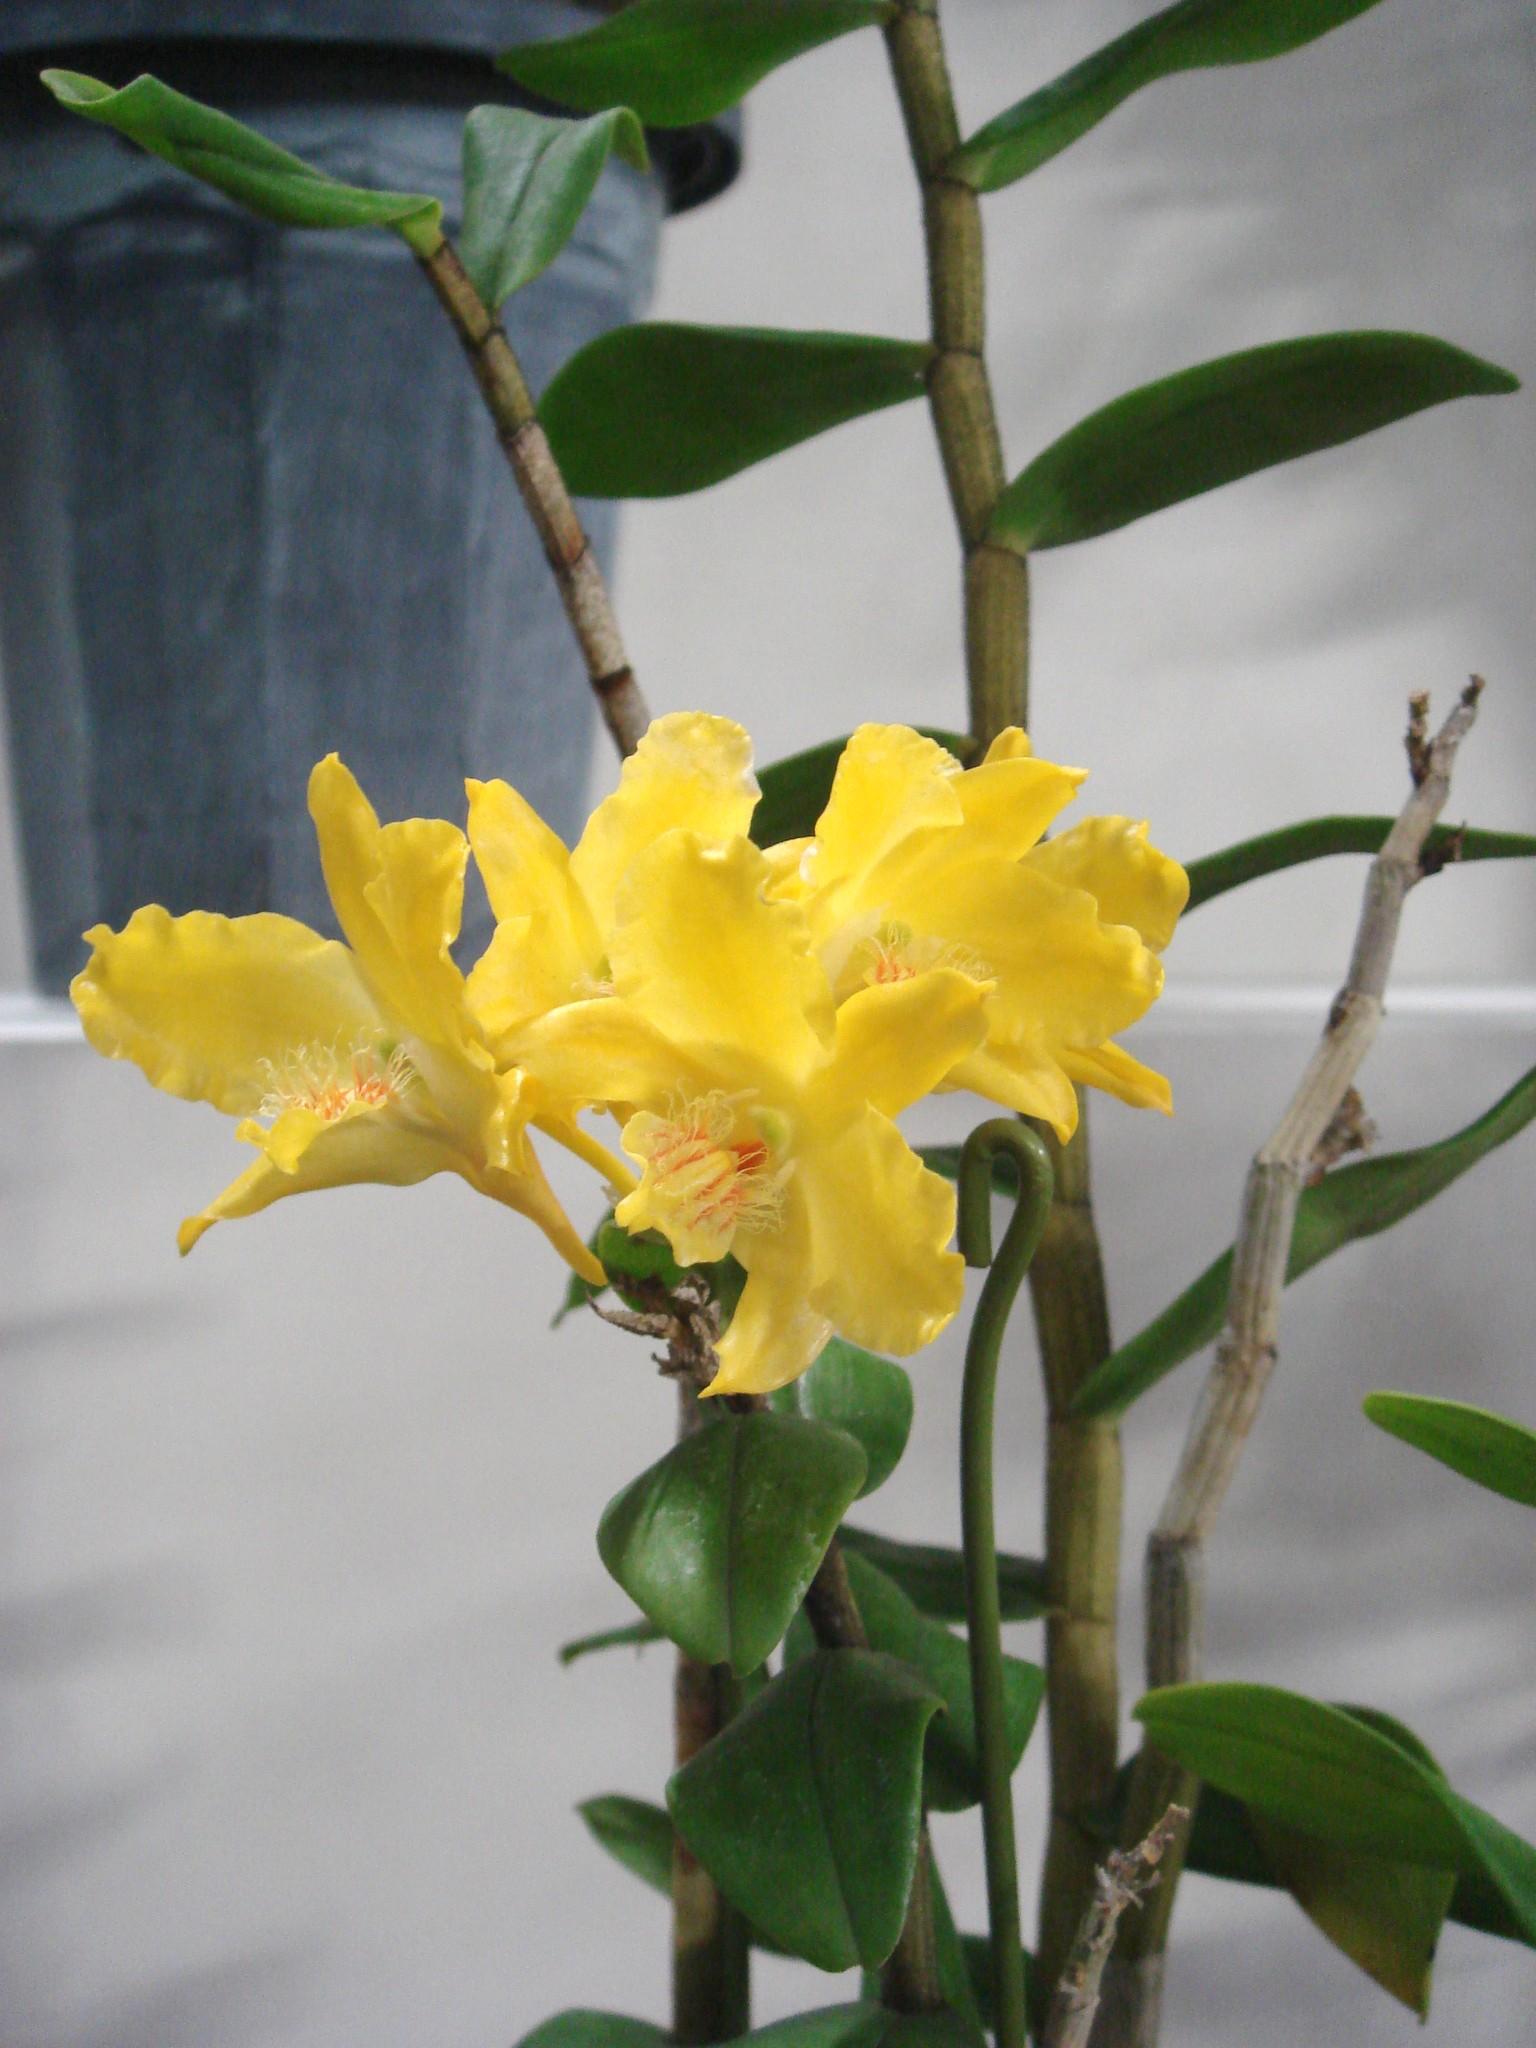 http://orchids.la.coocan.jp/Dendrobium/Dendrobium%20lowii/DSC06472.JPG